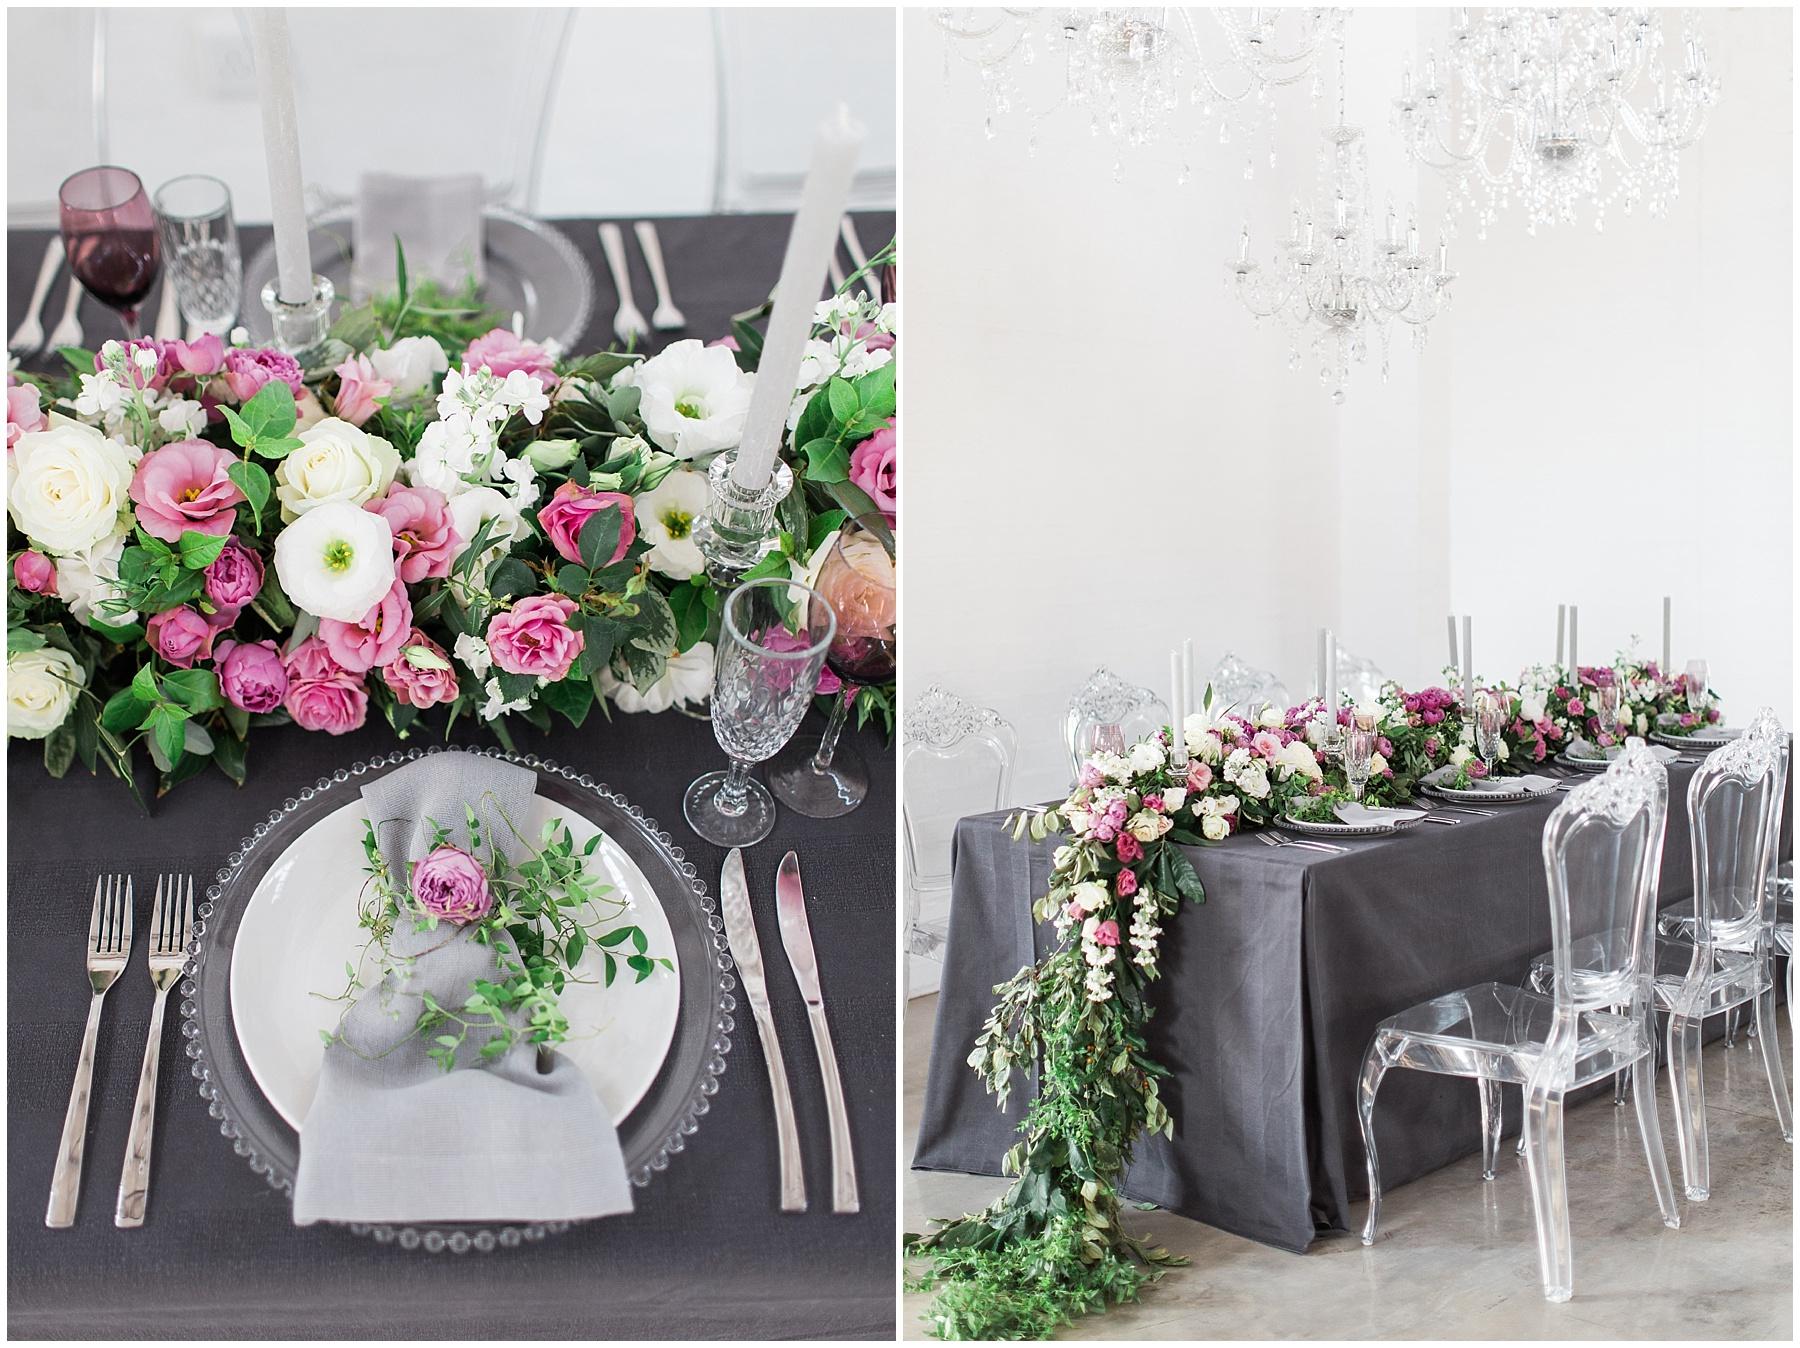 AliciaLandman_JoleneandZander_Wedding_The Pretty Blog_0403.jpg